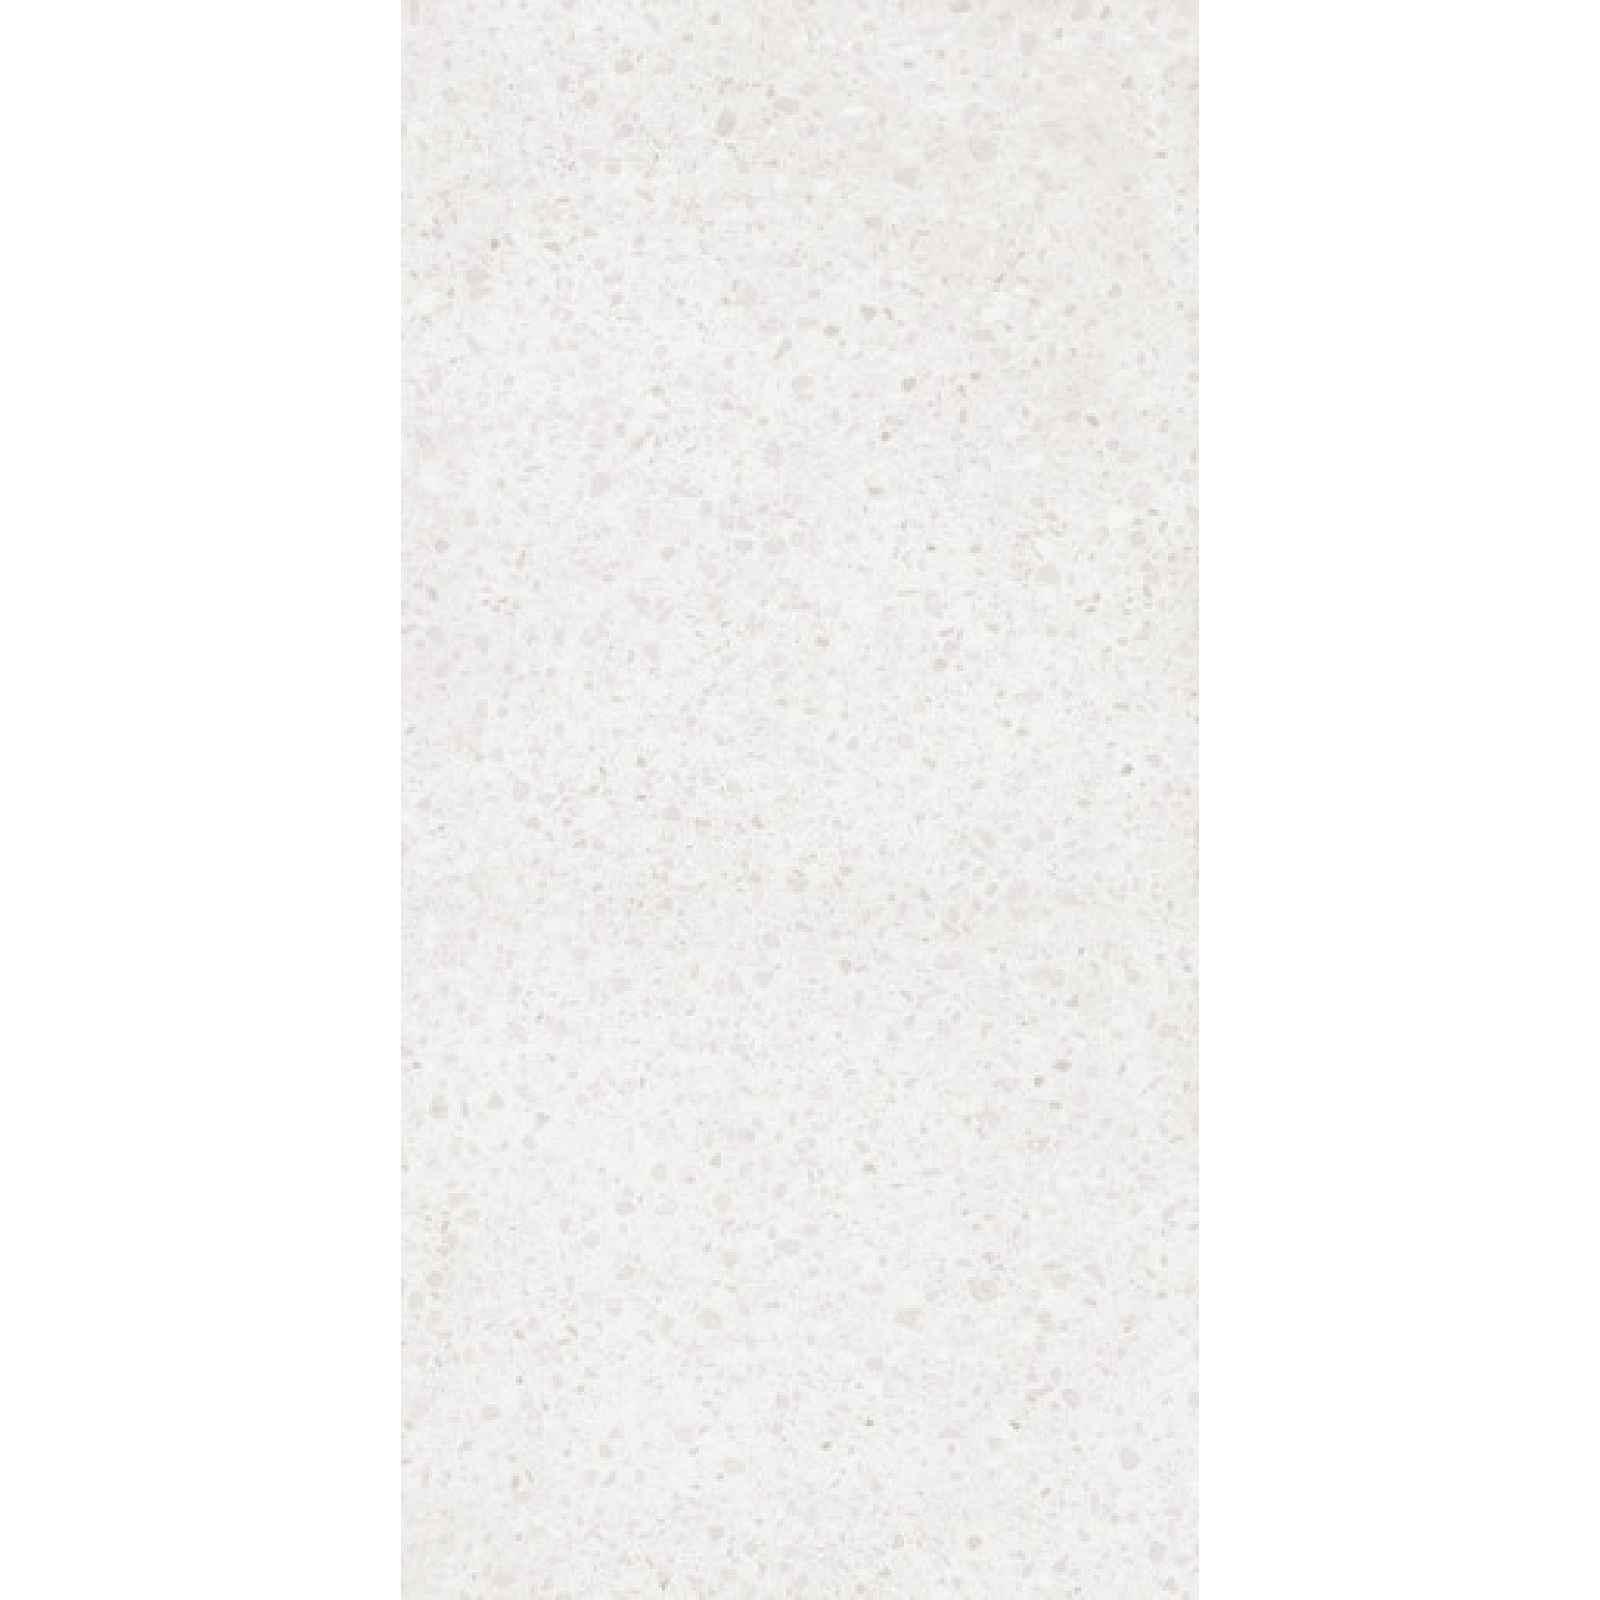 Dlažba RAKO Porfido bílá 60x120 cm mat / lesk DASV1810.1